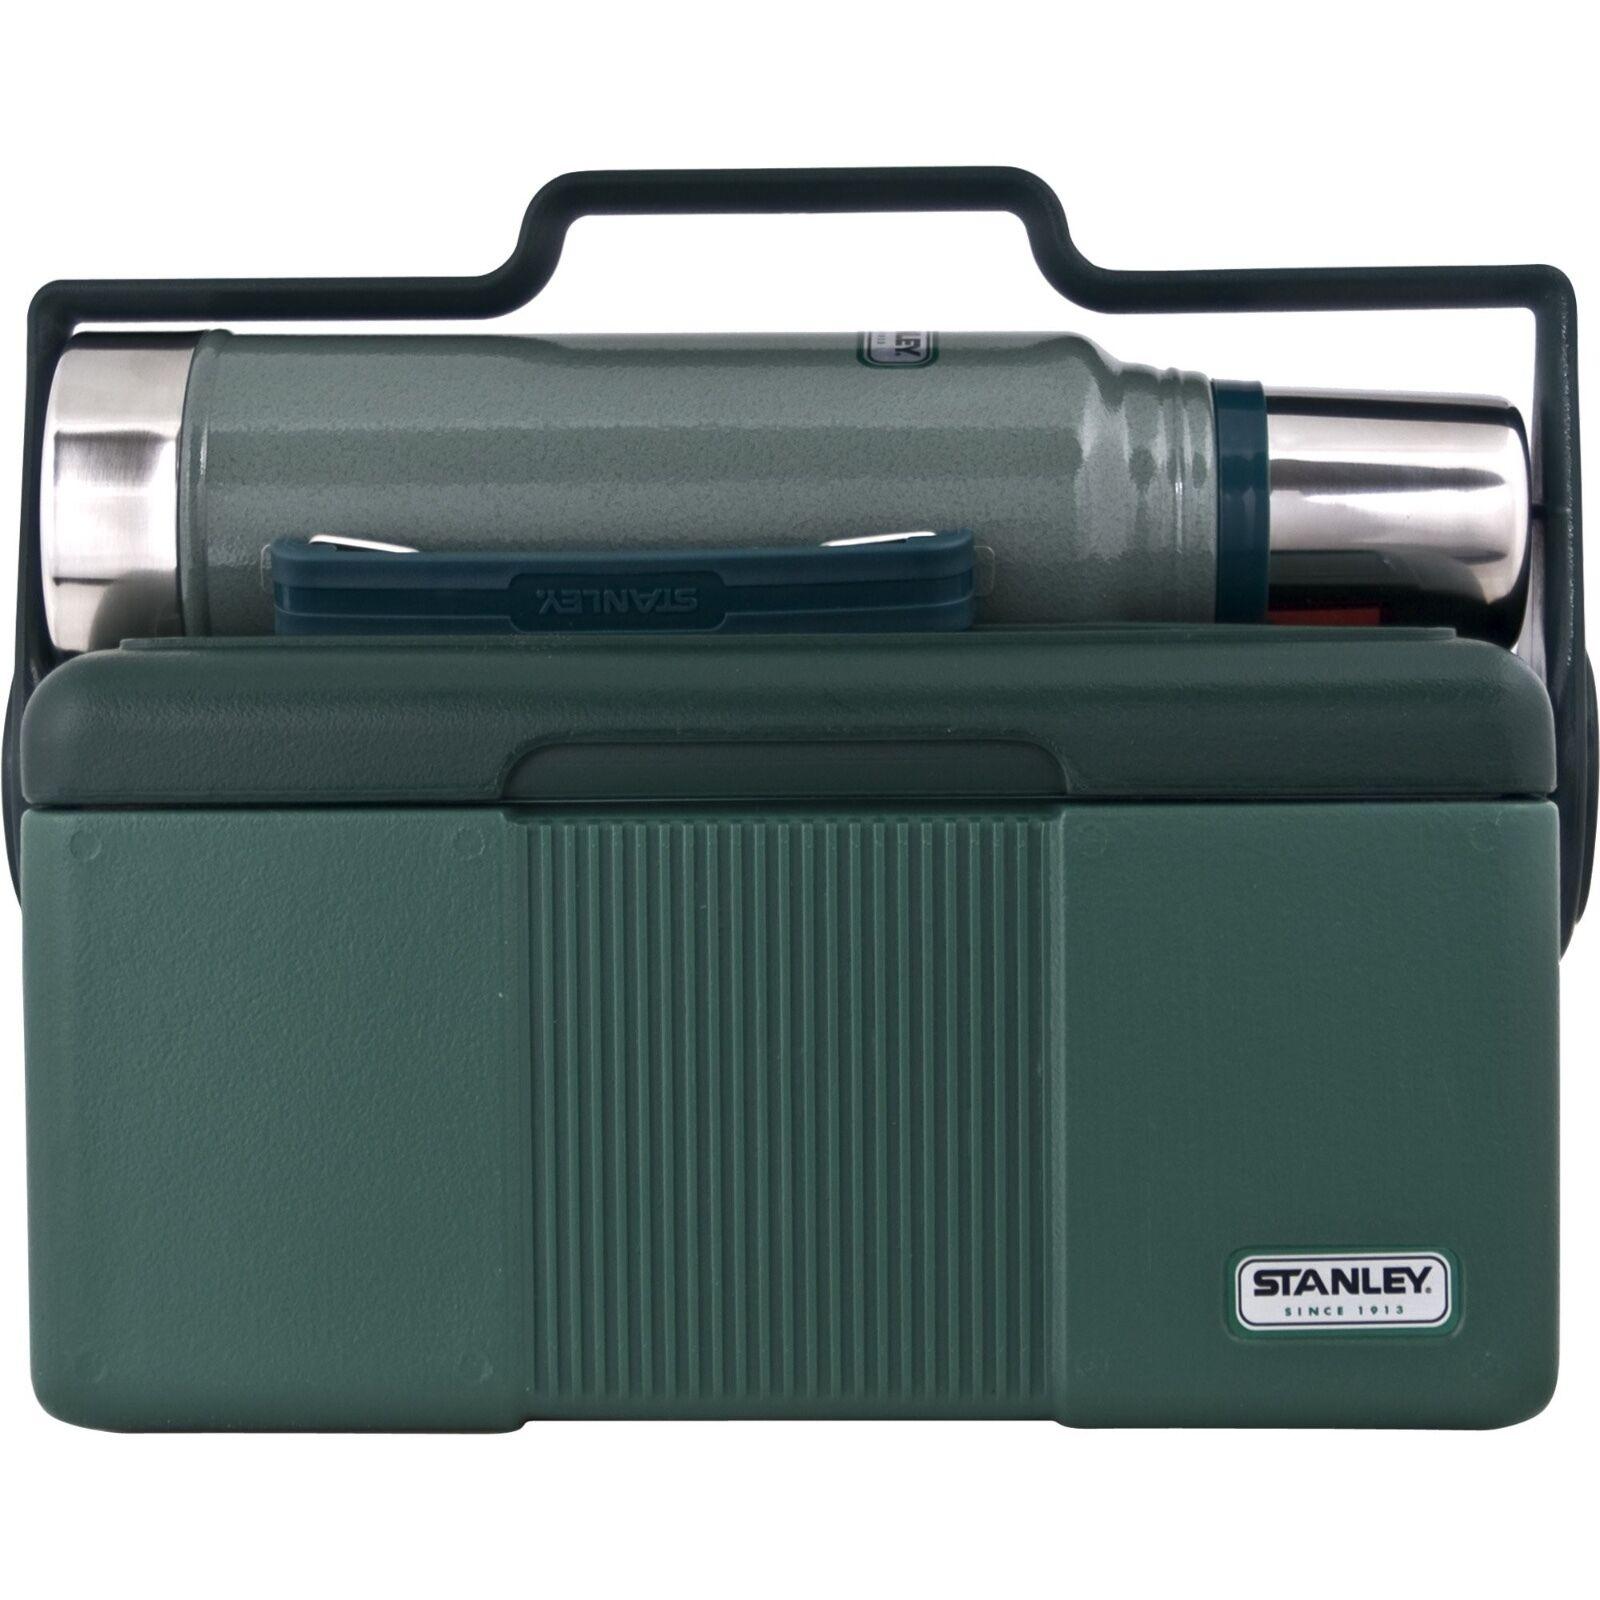 Caja de almuerzo para adultos Enfriador de comestibles Stanley caliente Termo Botella Camping al aire libre